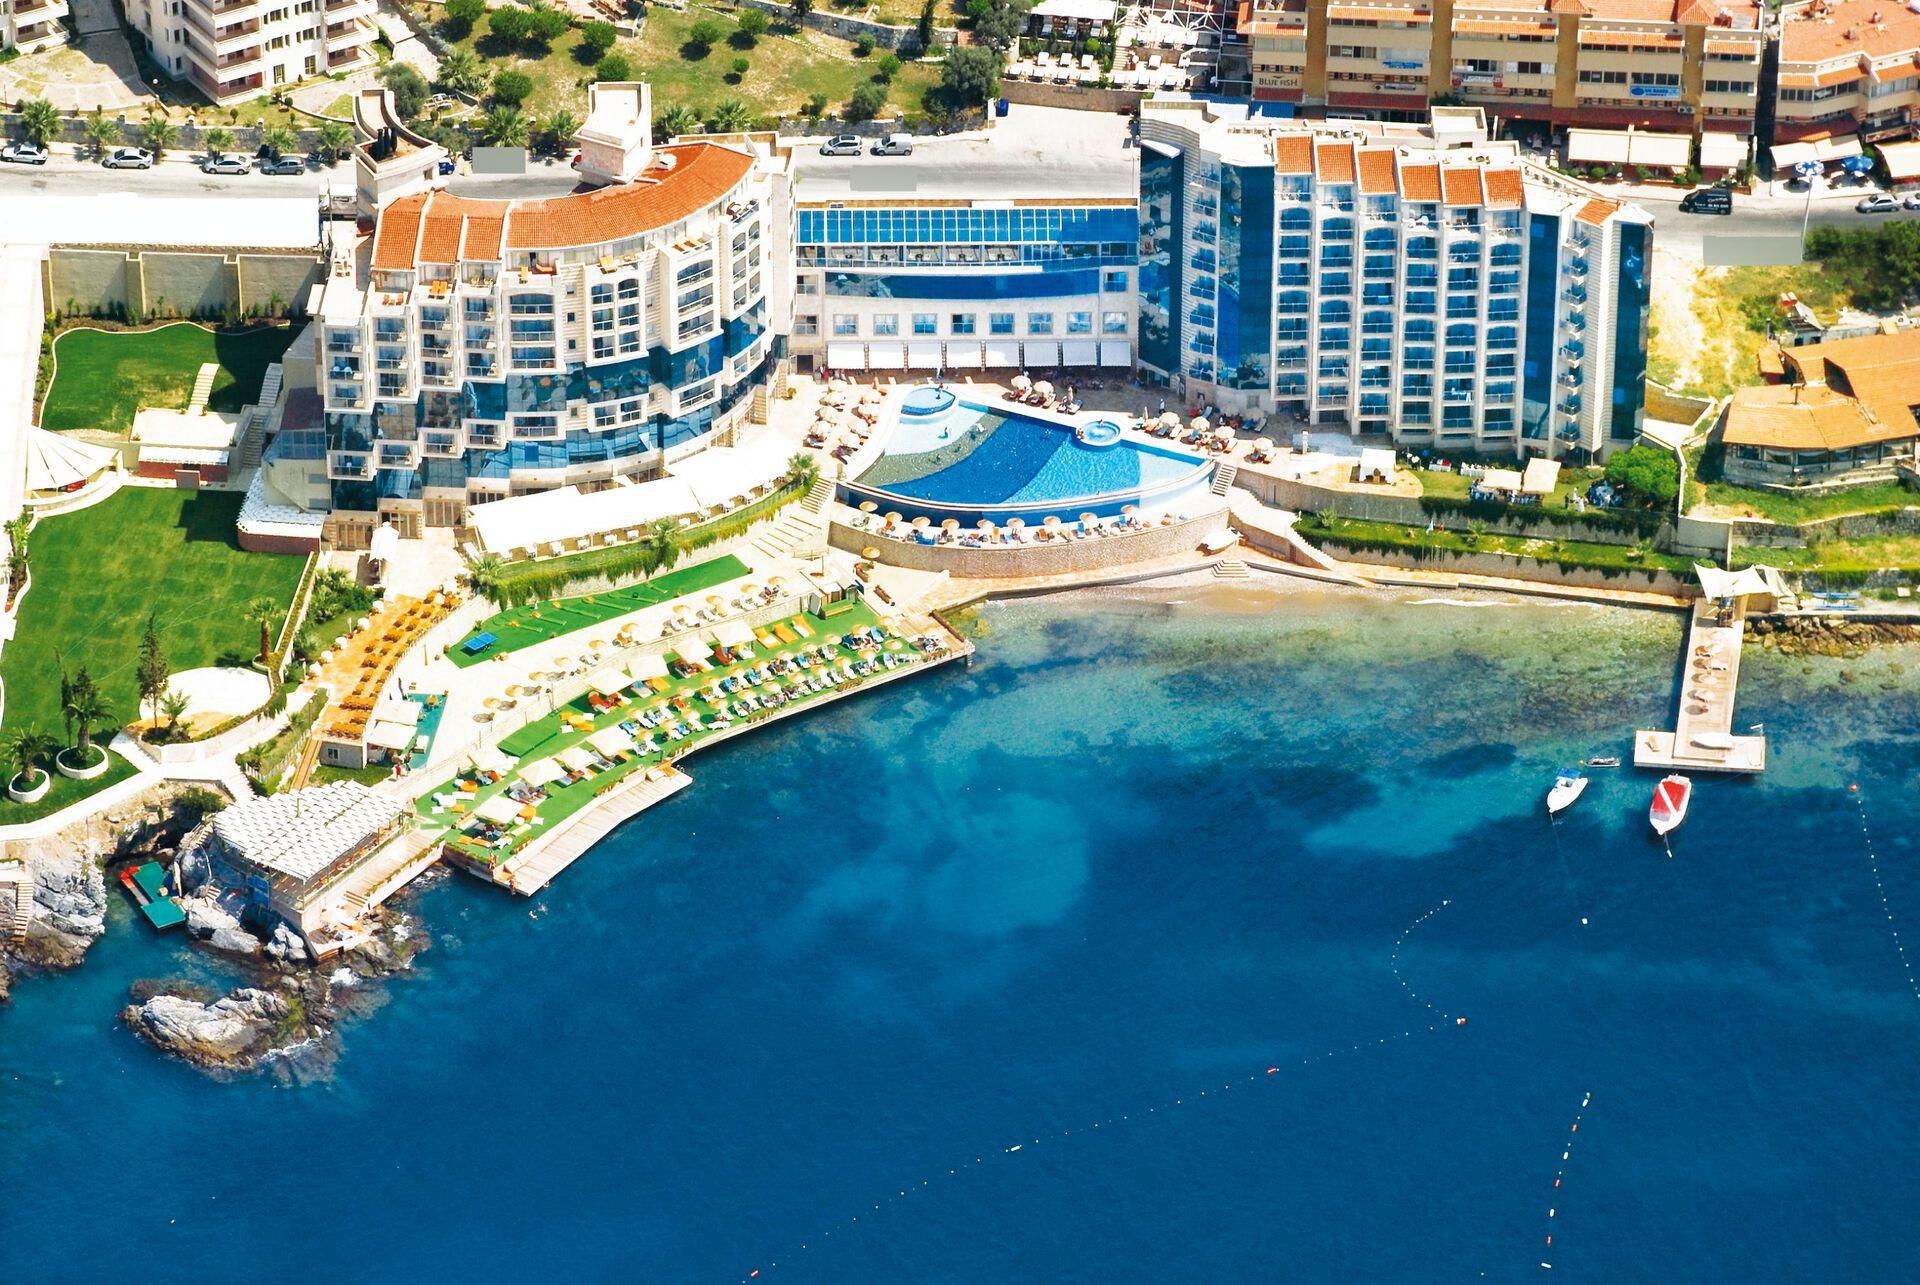 Séjour Izmir - Hotel Charisma de Luxe - 5*